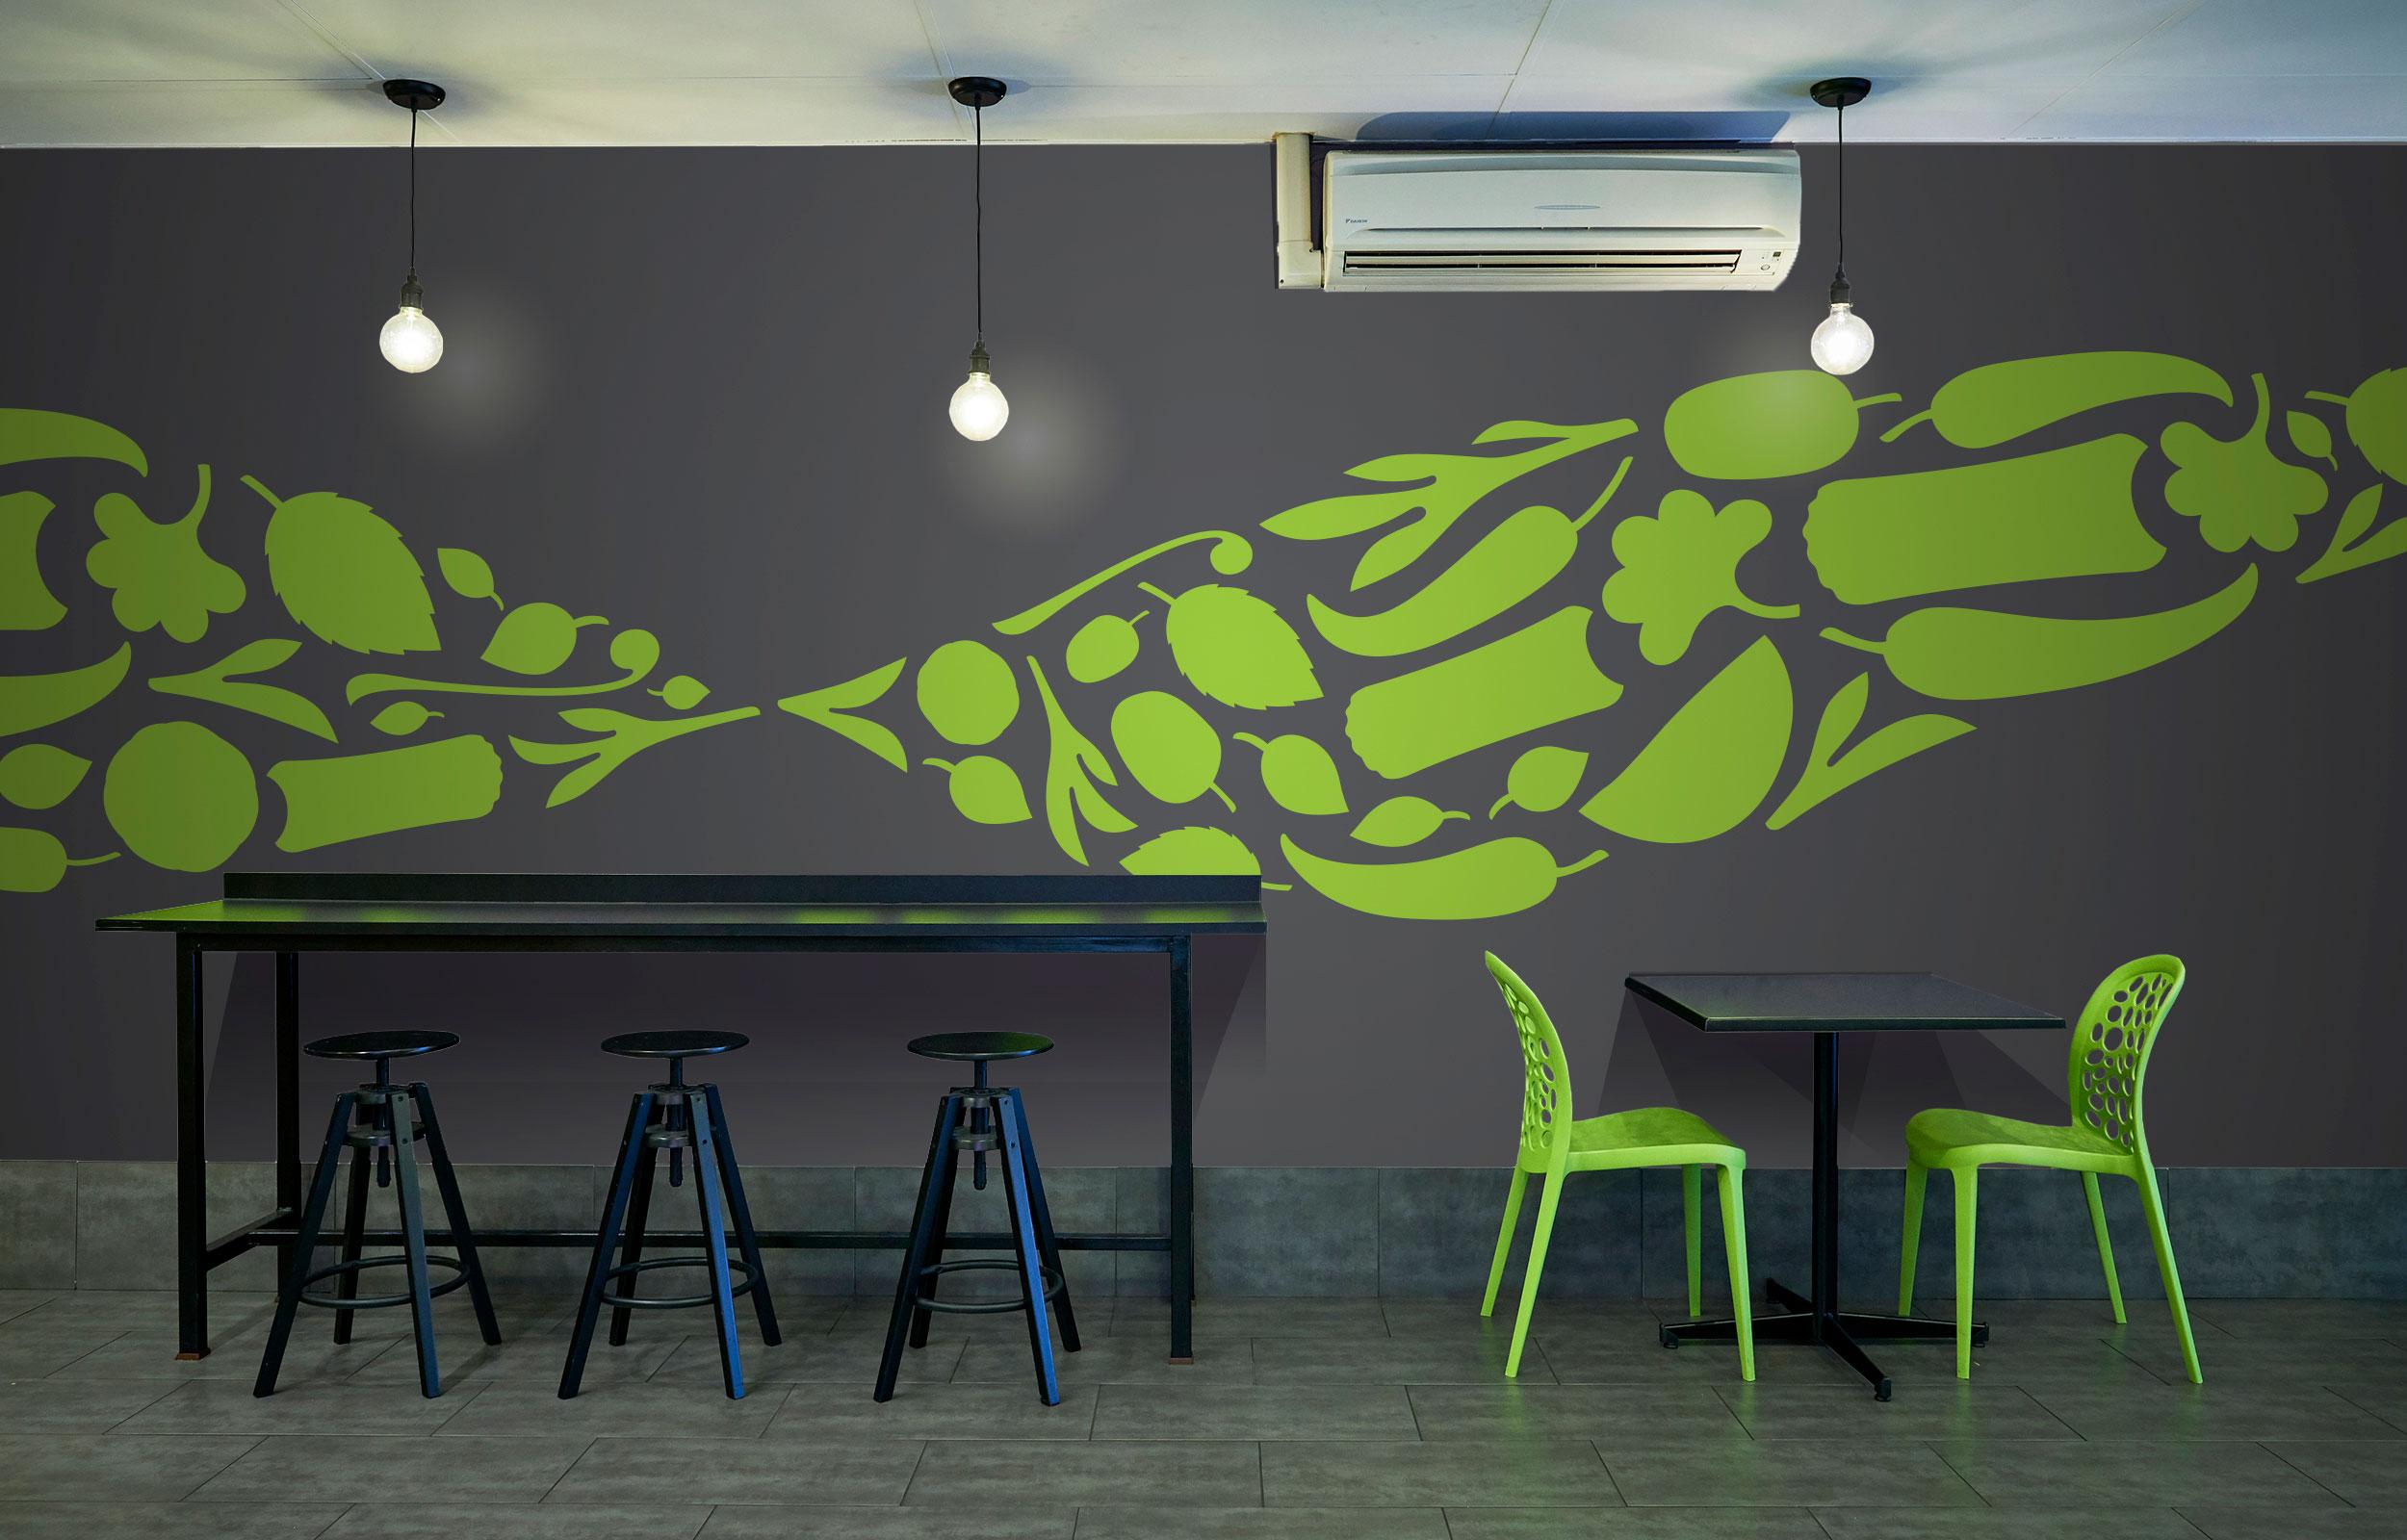 enoki-graphic-greenbites-3.jpg